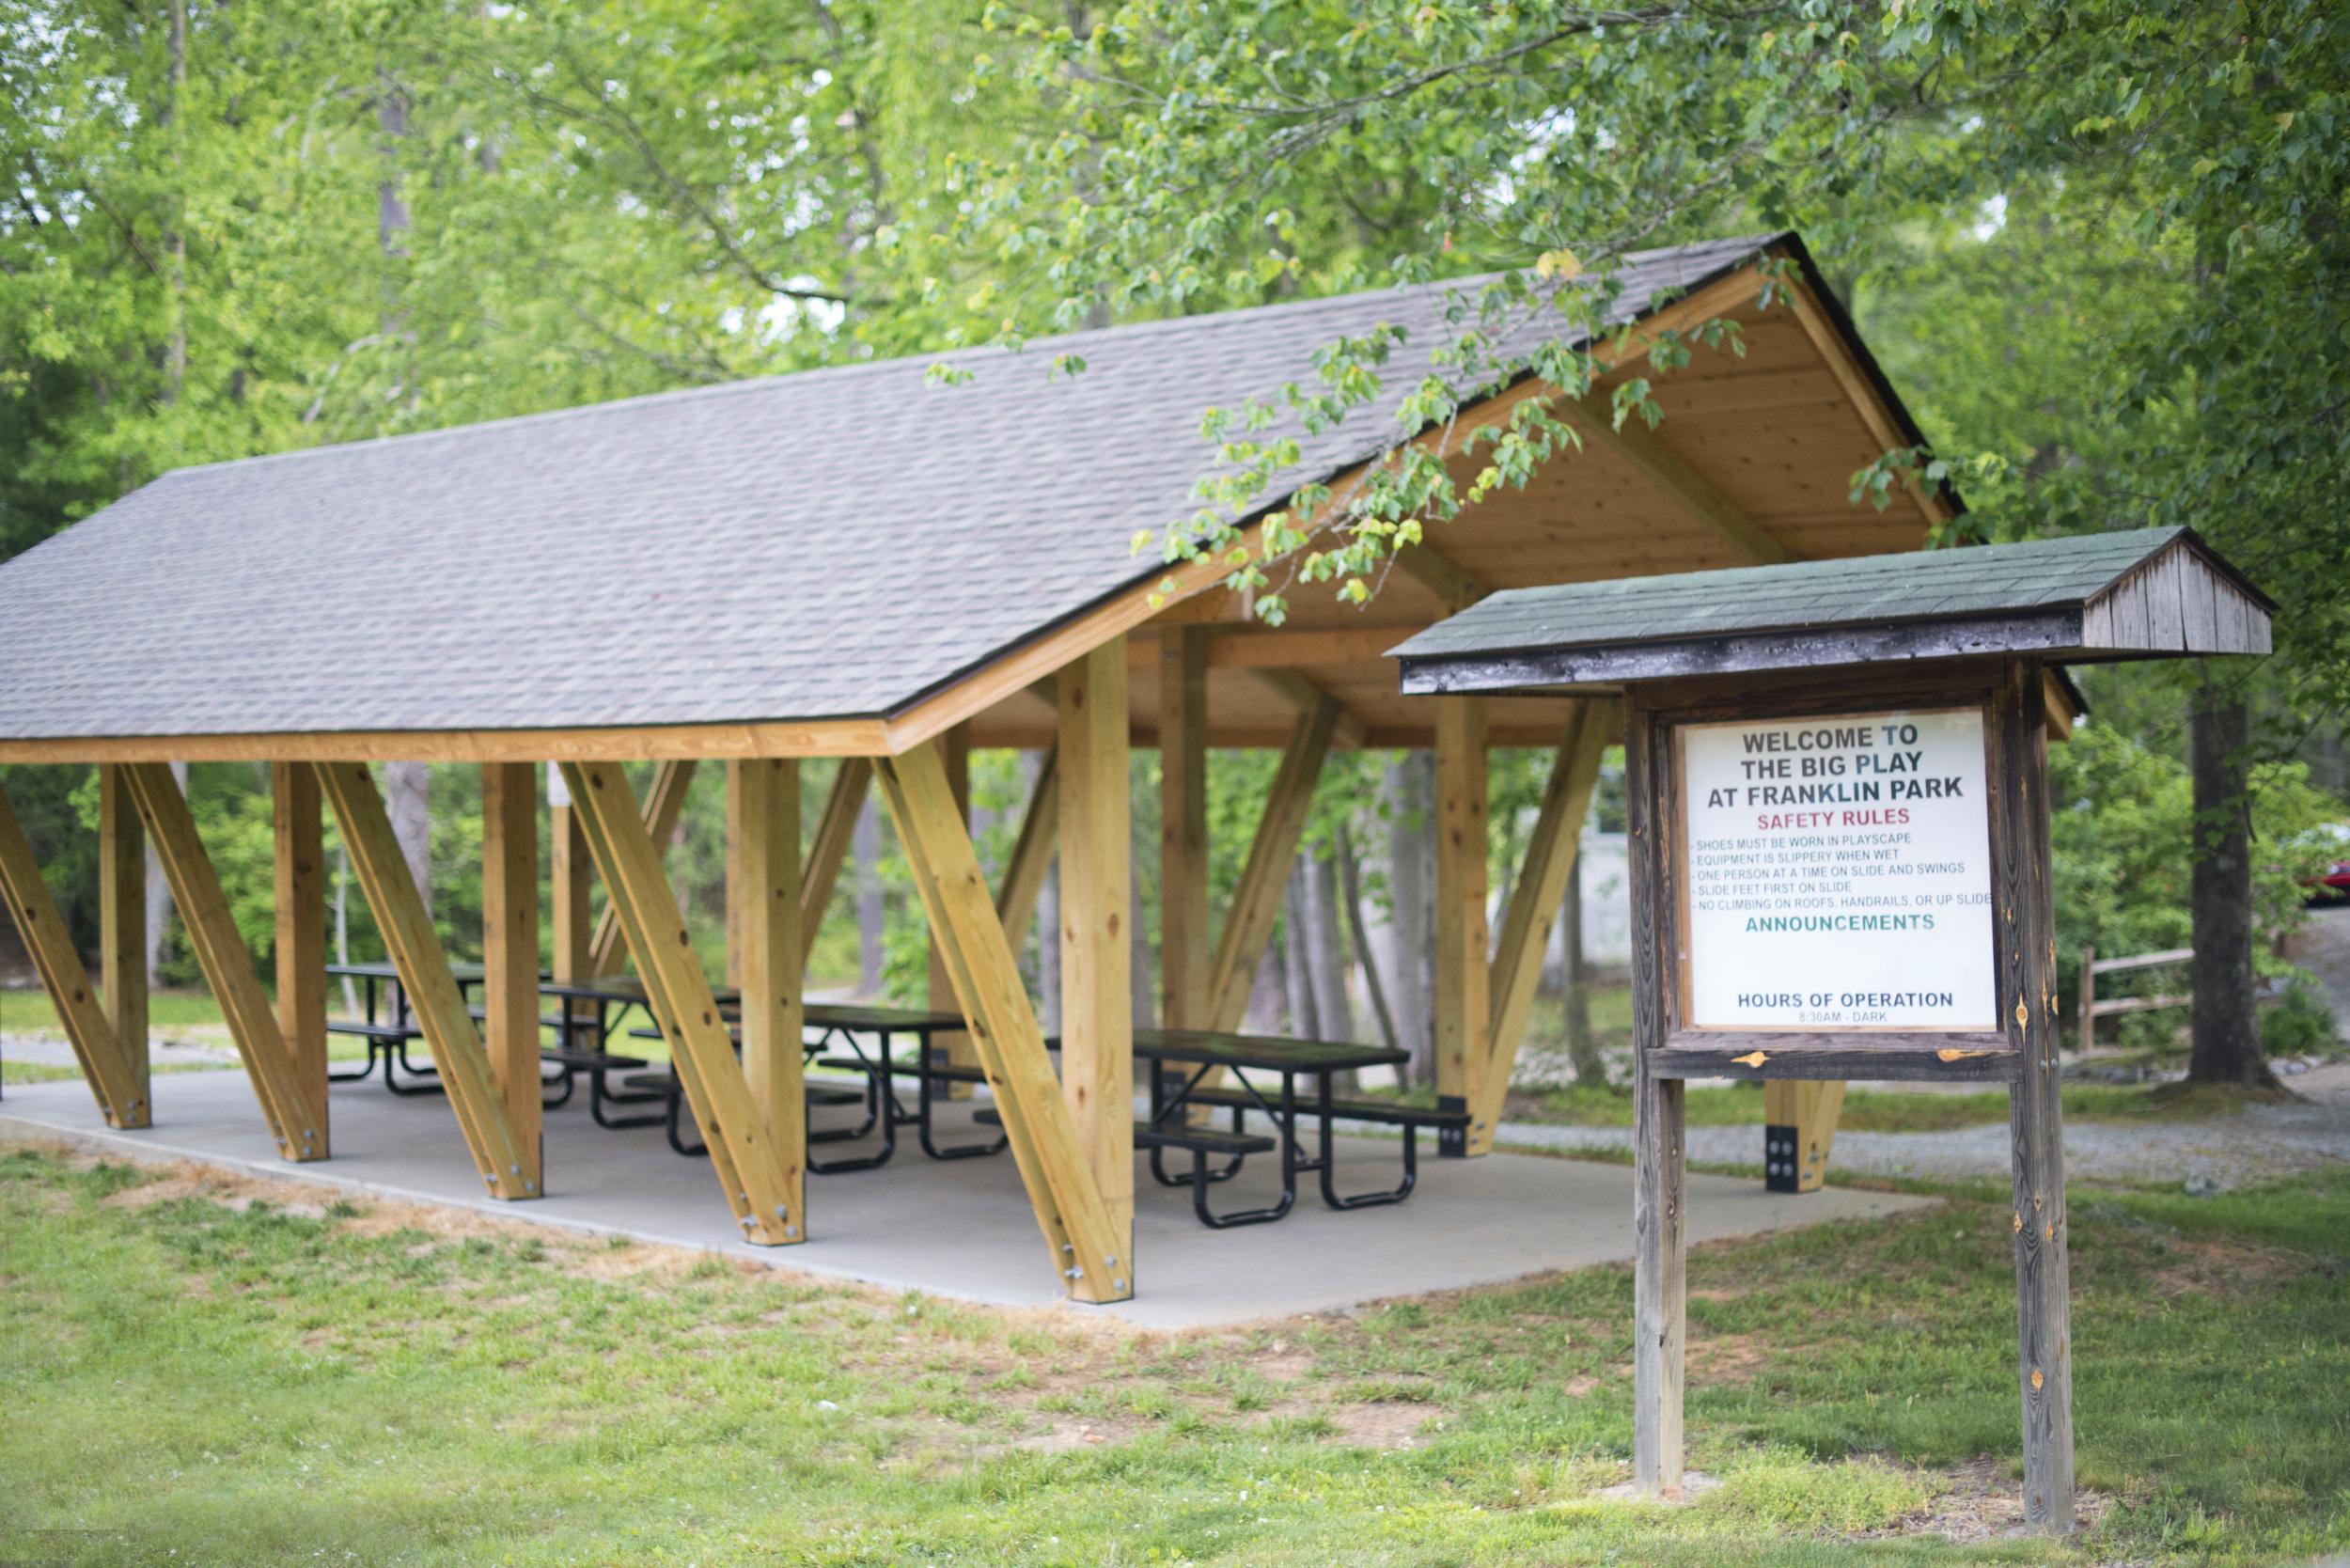 Franklin Park Pavilion